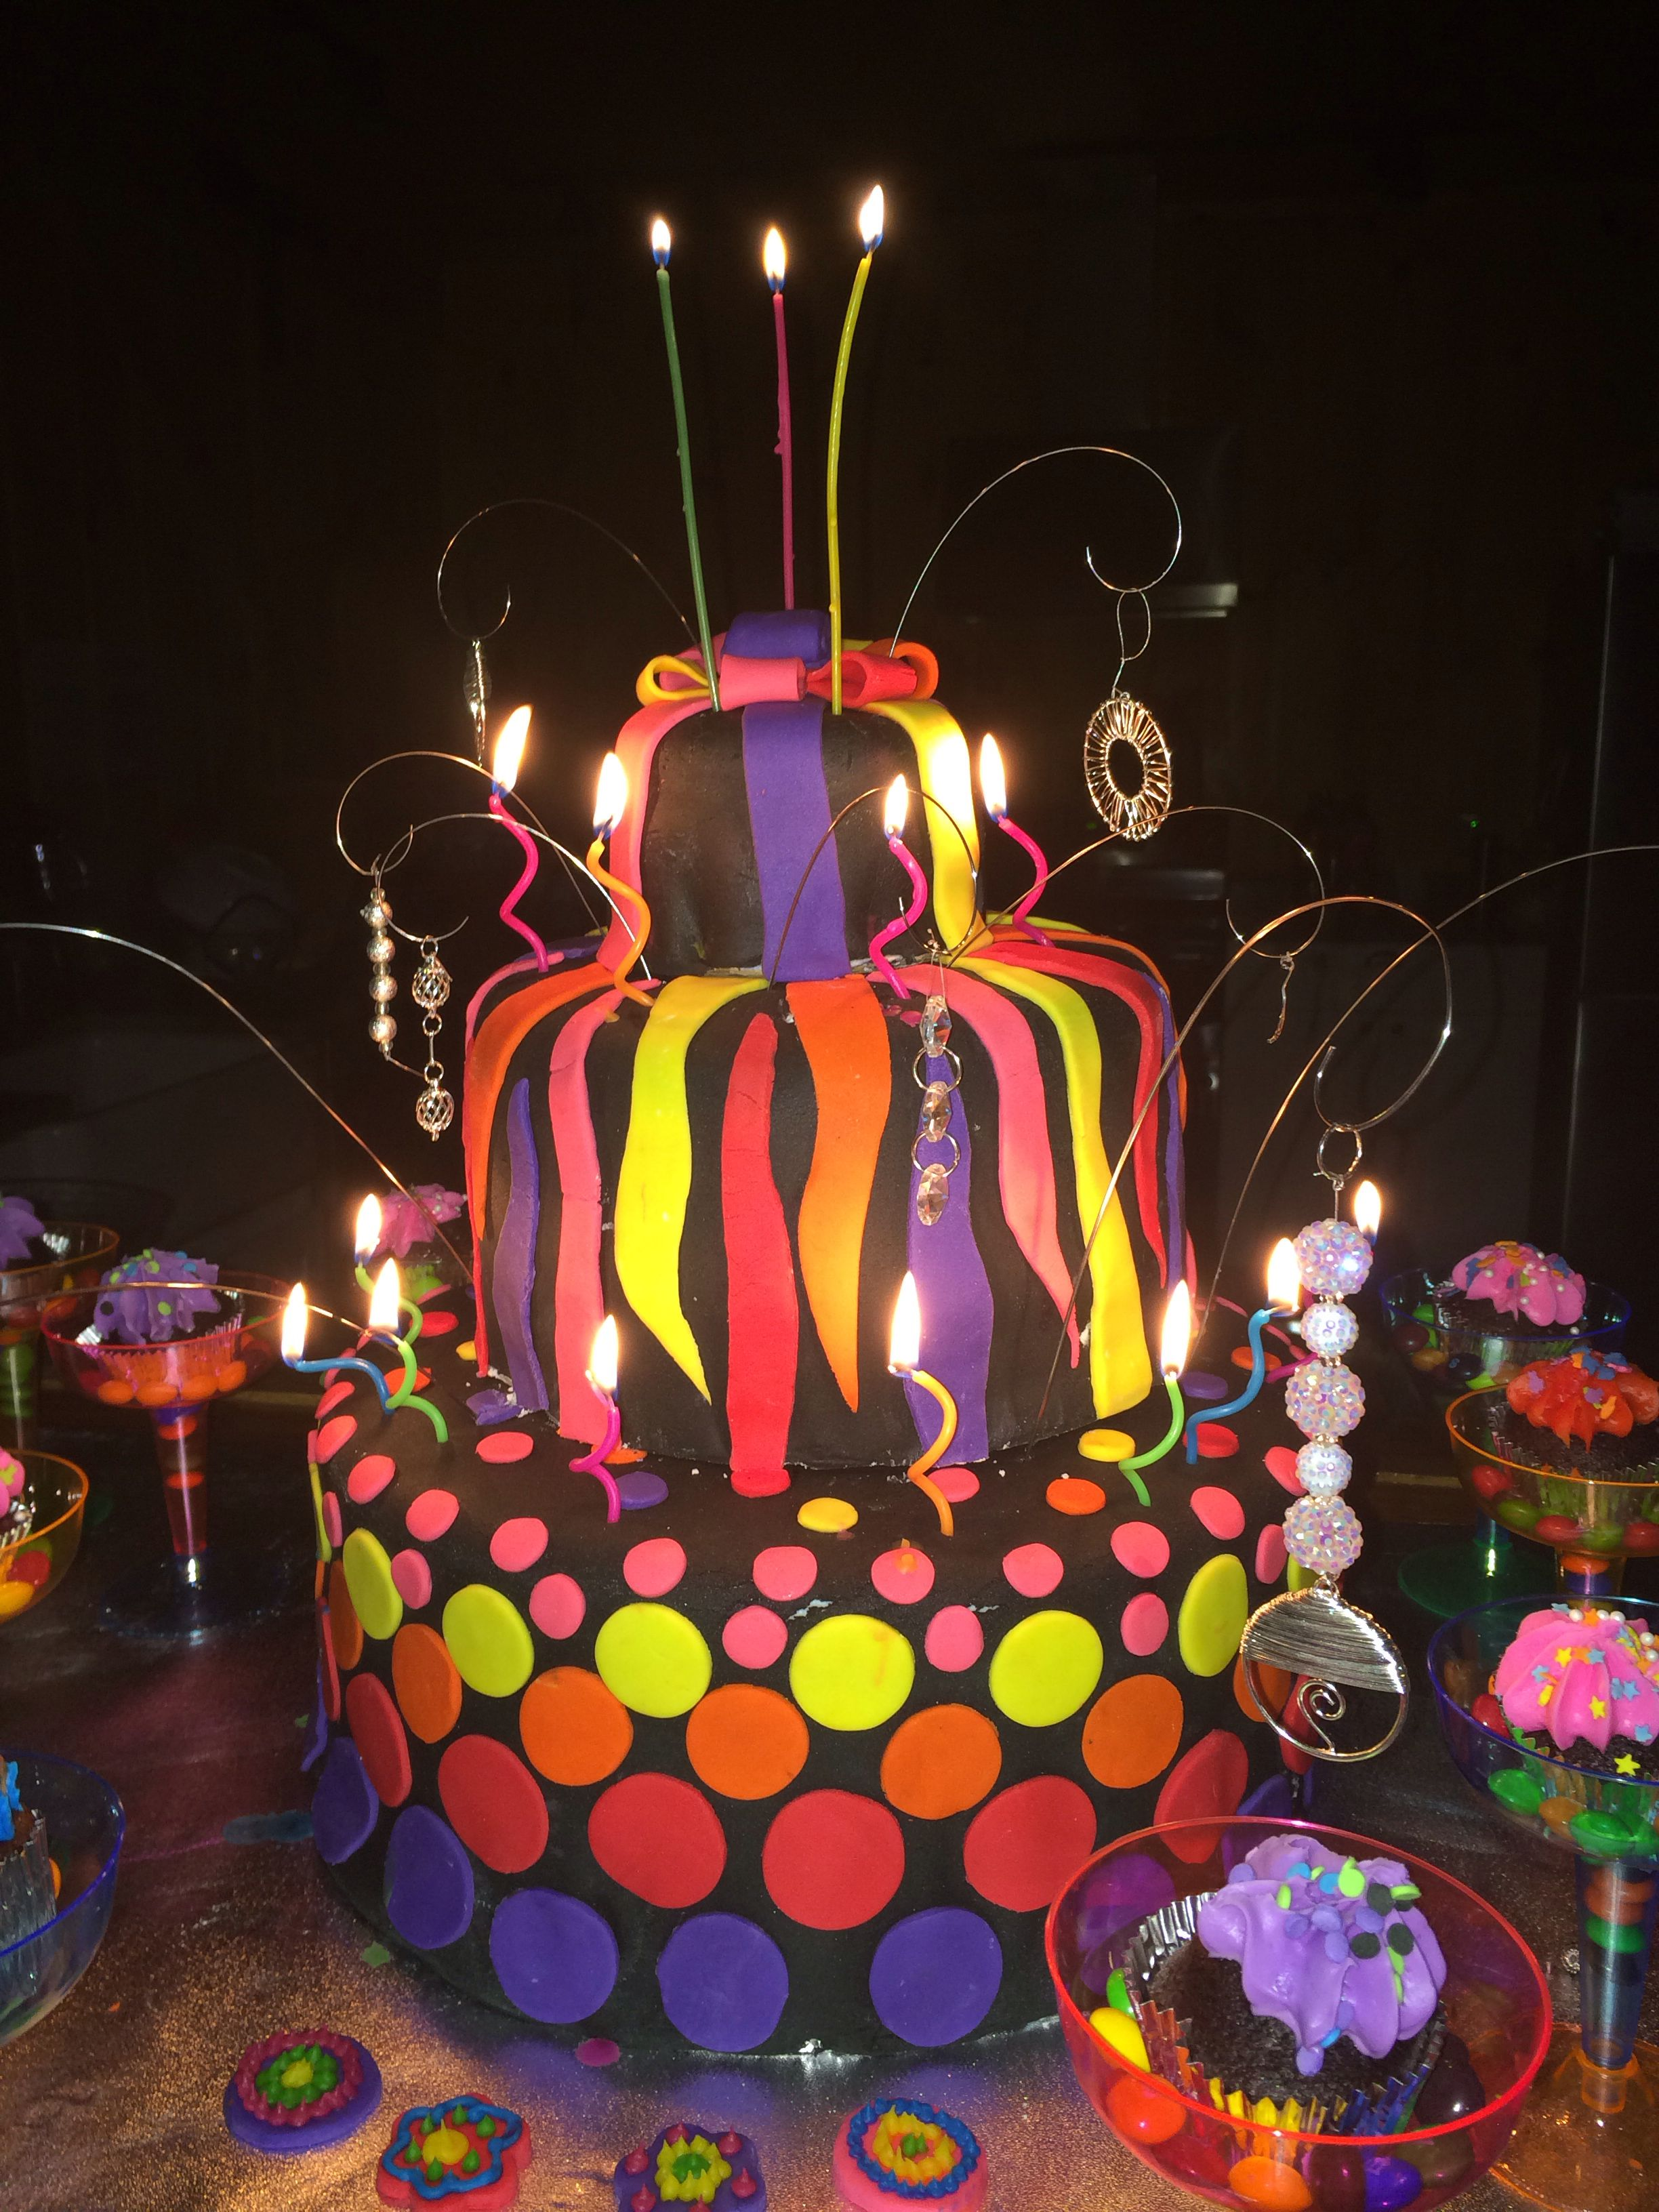 Neon Glow In The Dark Birthday Cake Idea Random